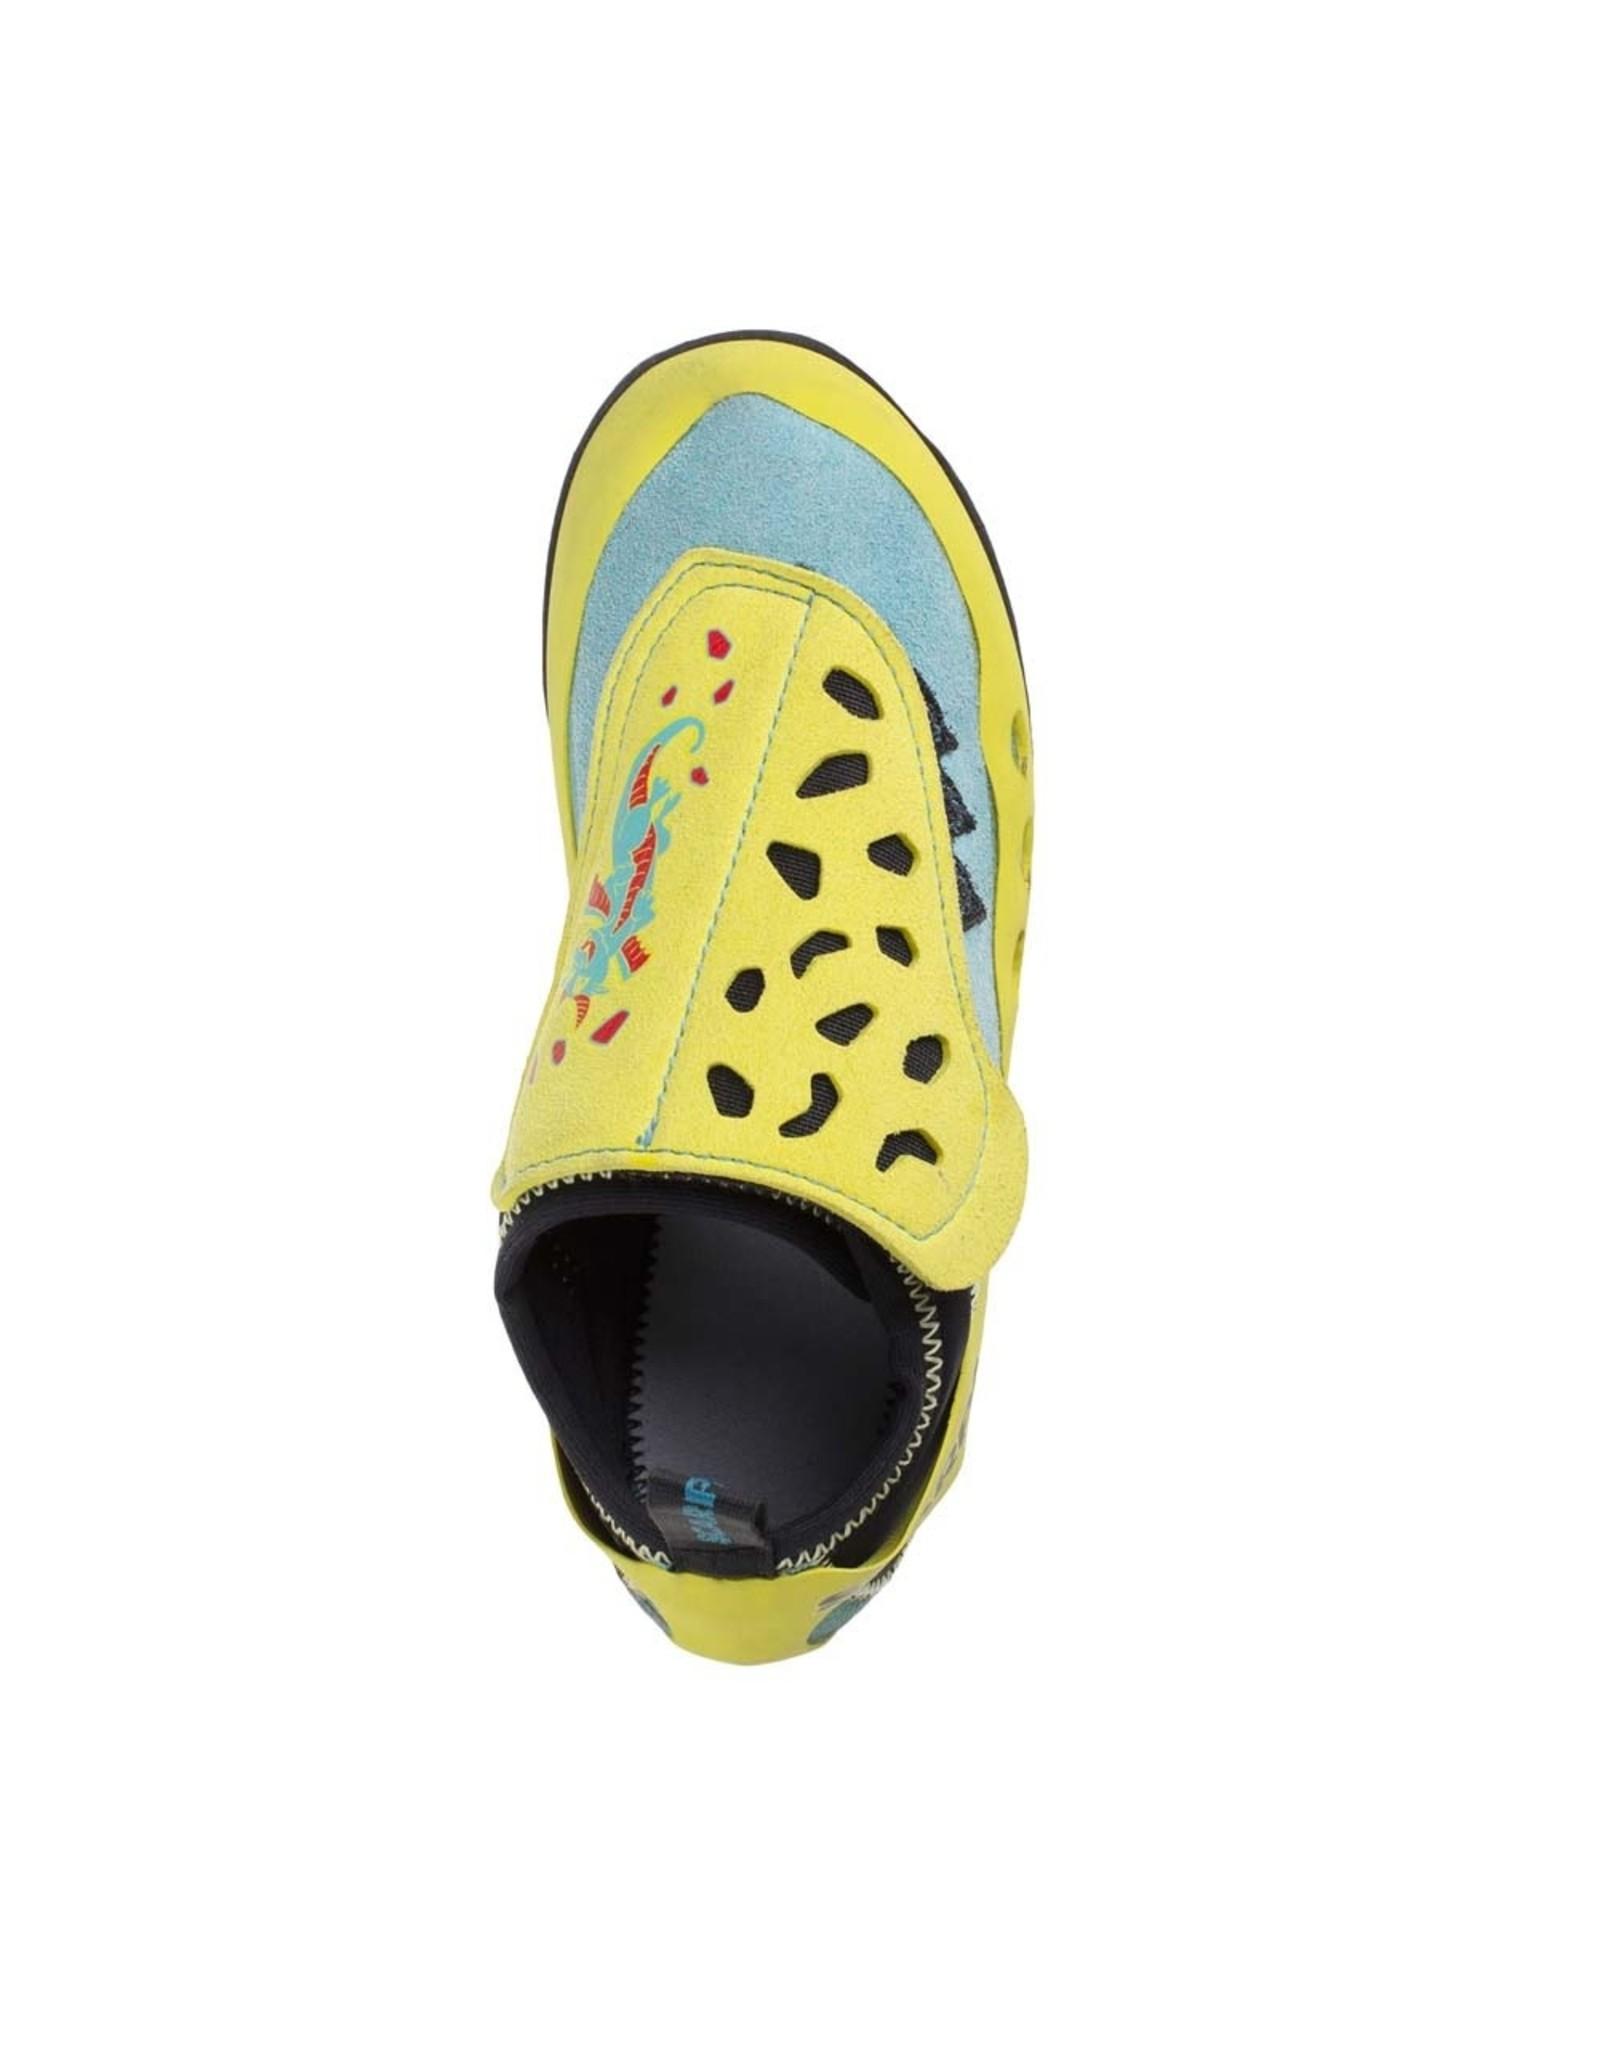 Scarpa Scarpa Piki Kids Rock Shoe